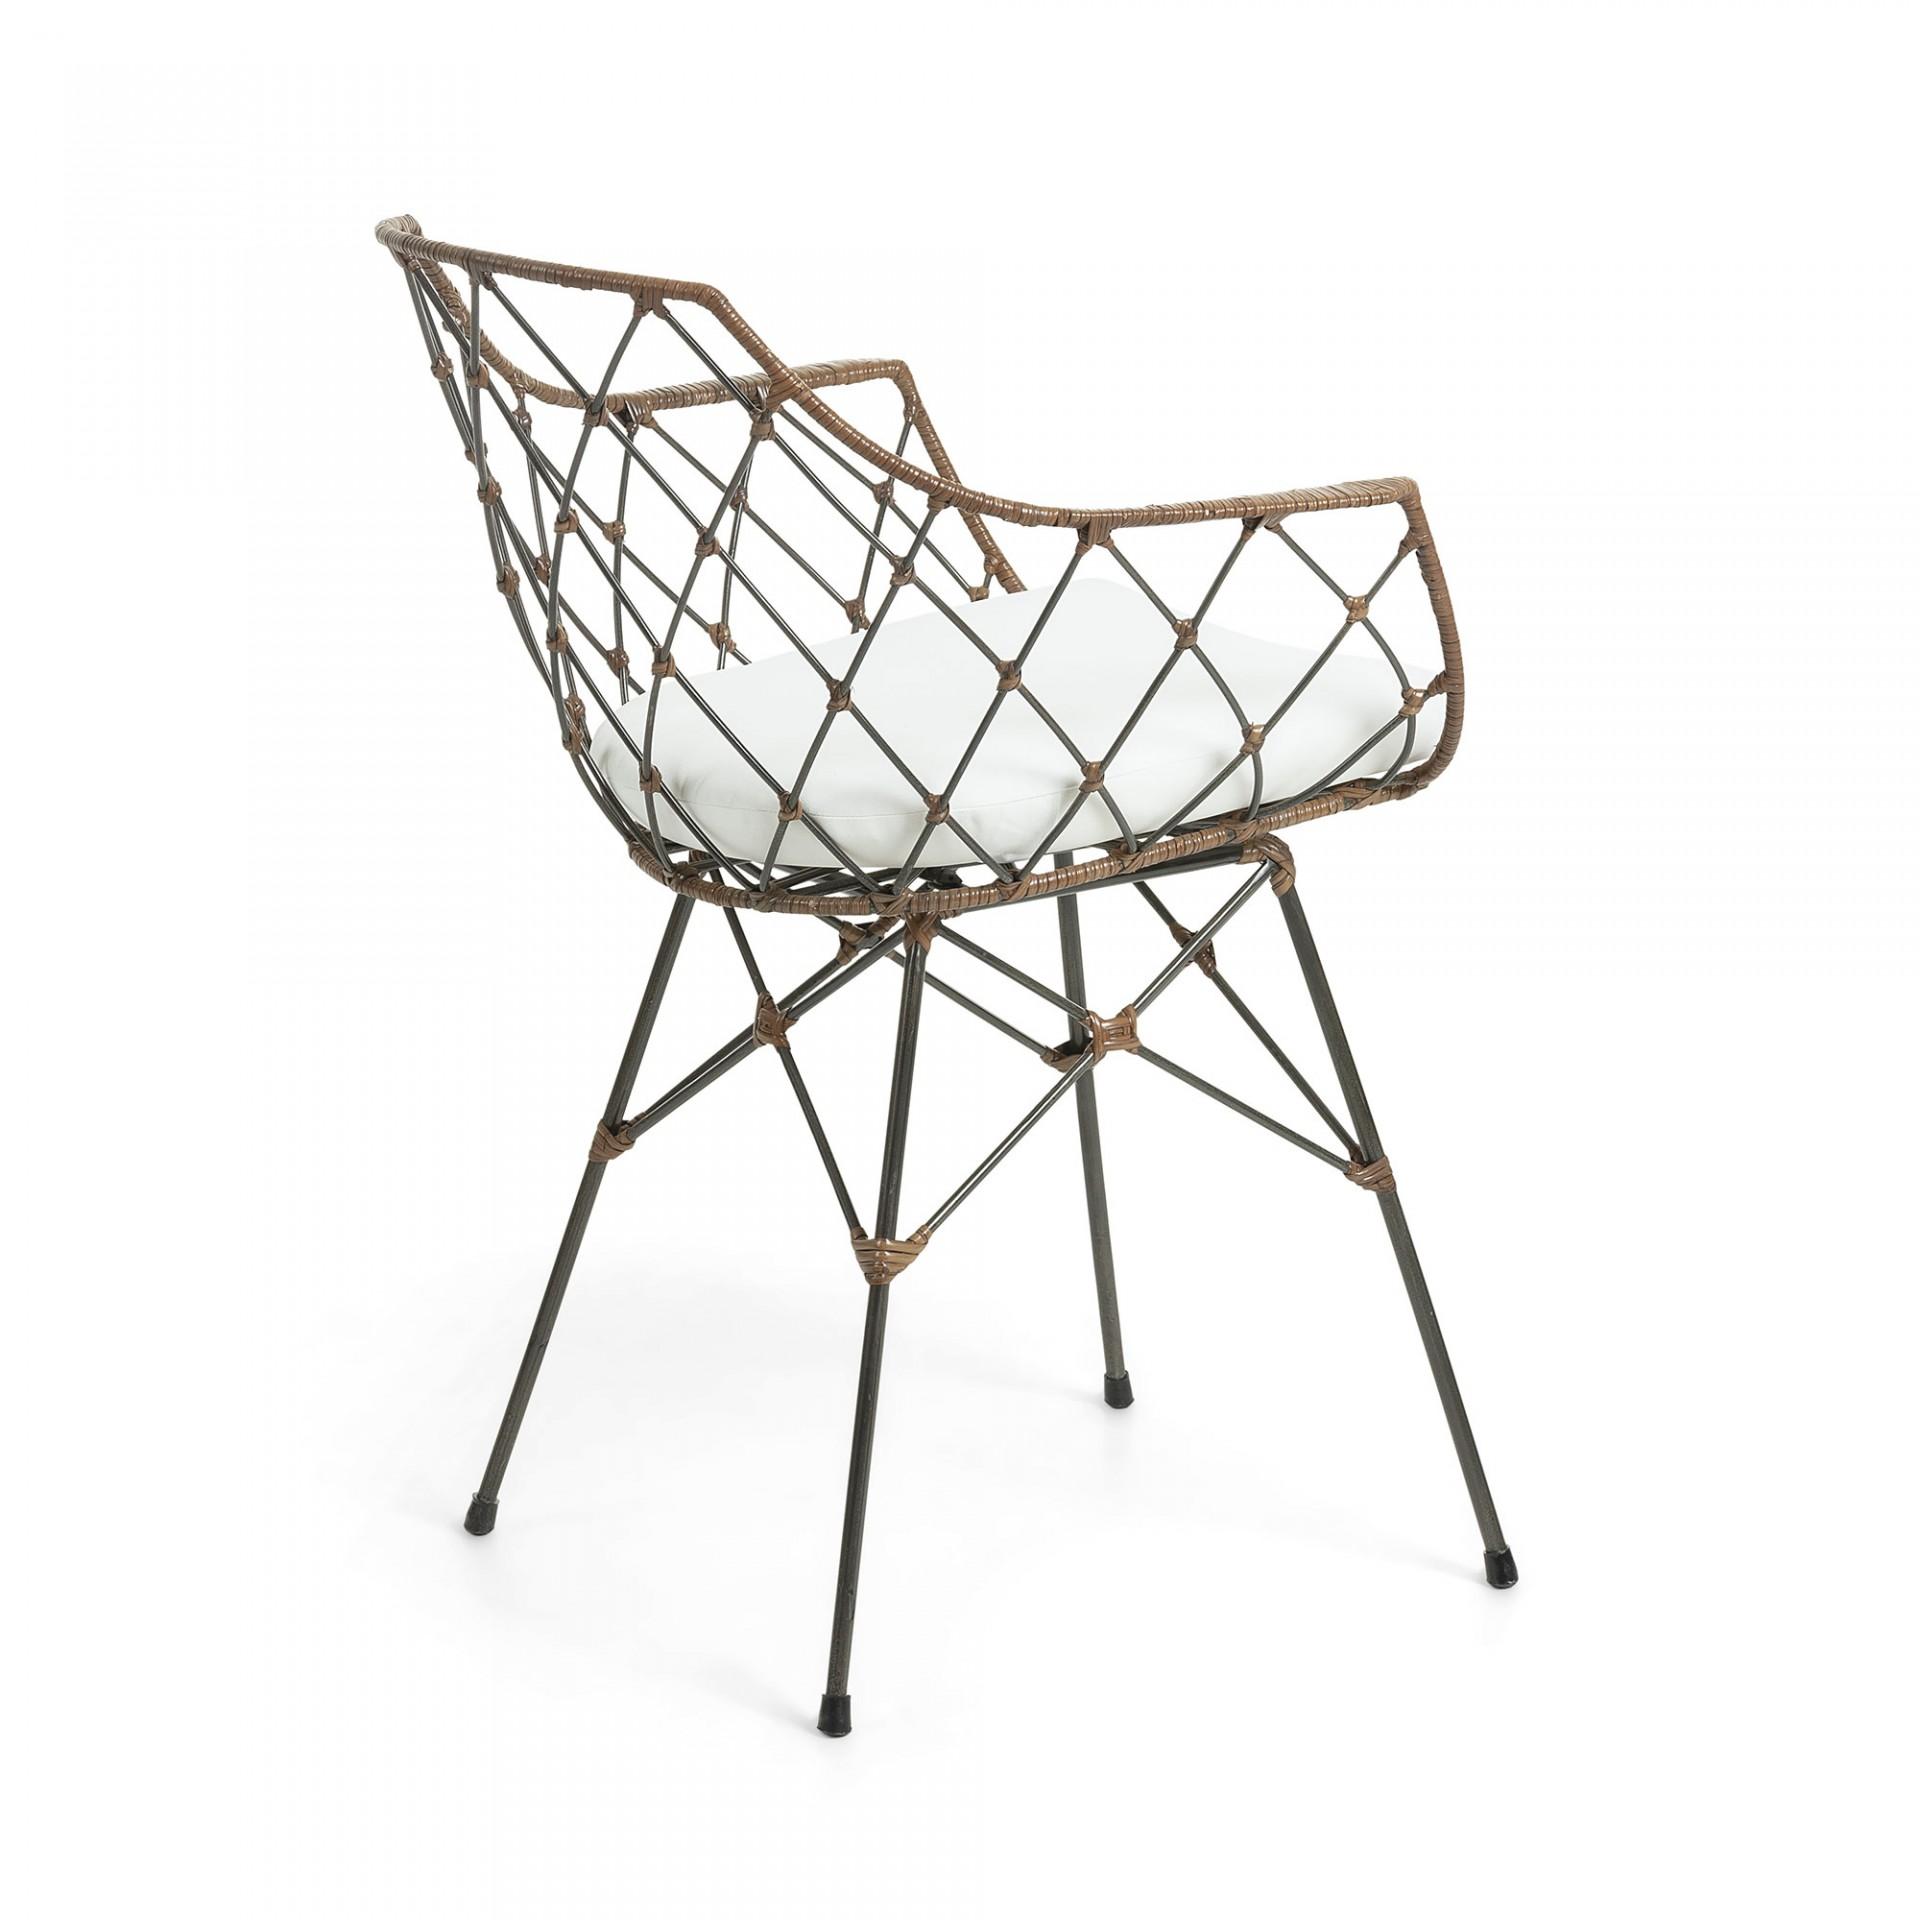 Cadeira Lux, c/almofada, metal/vime, 40x40x80